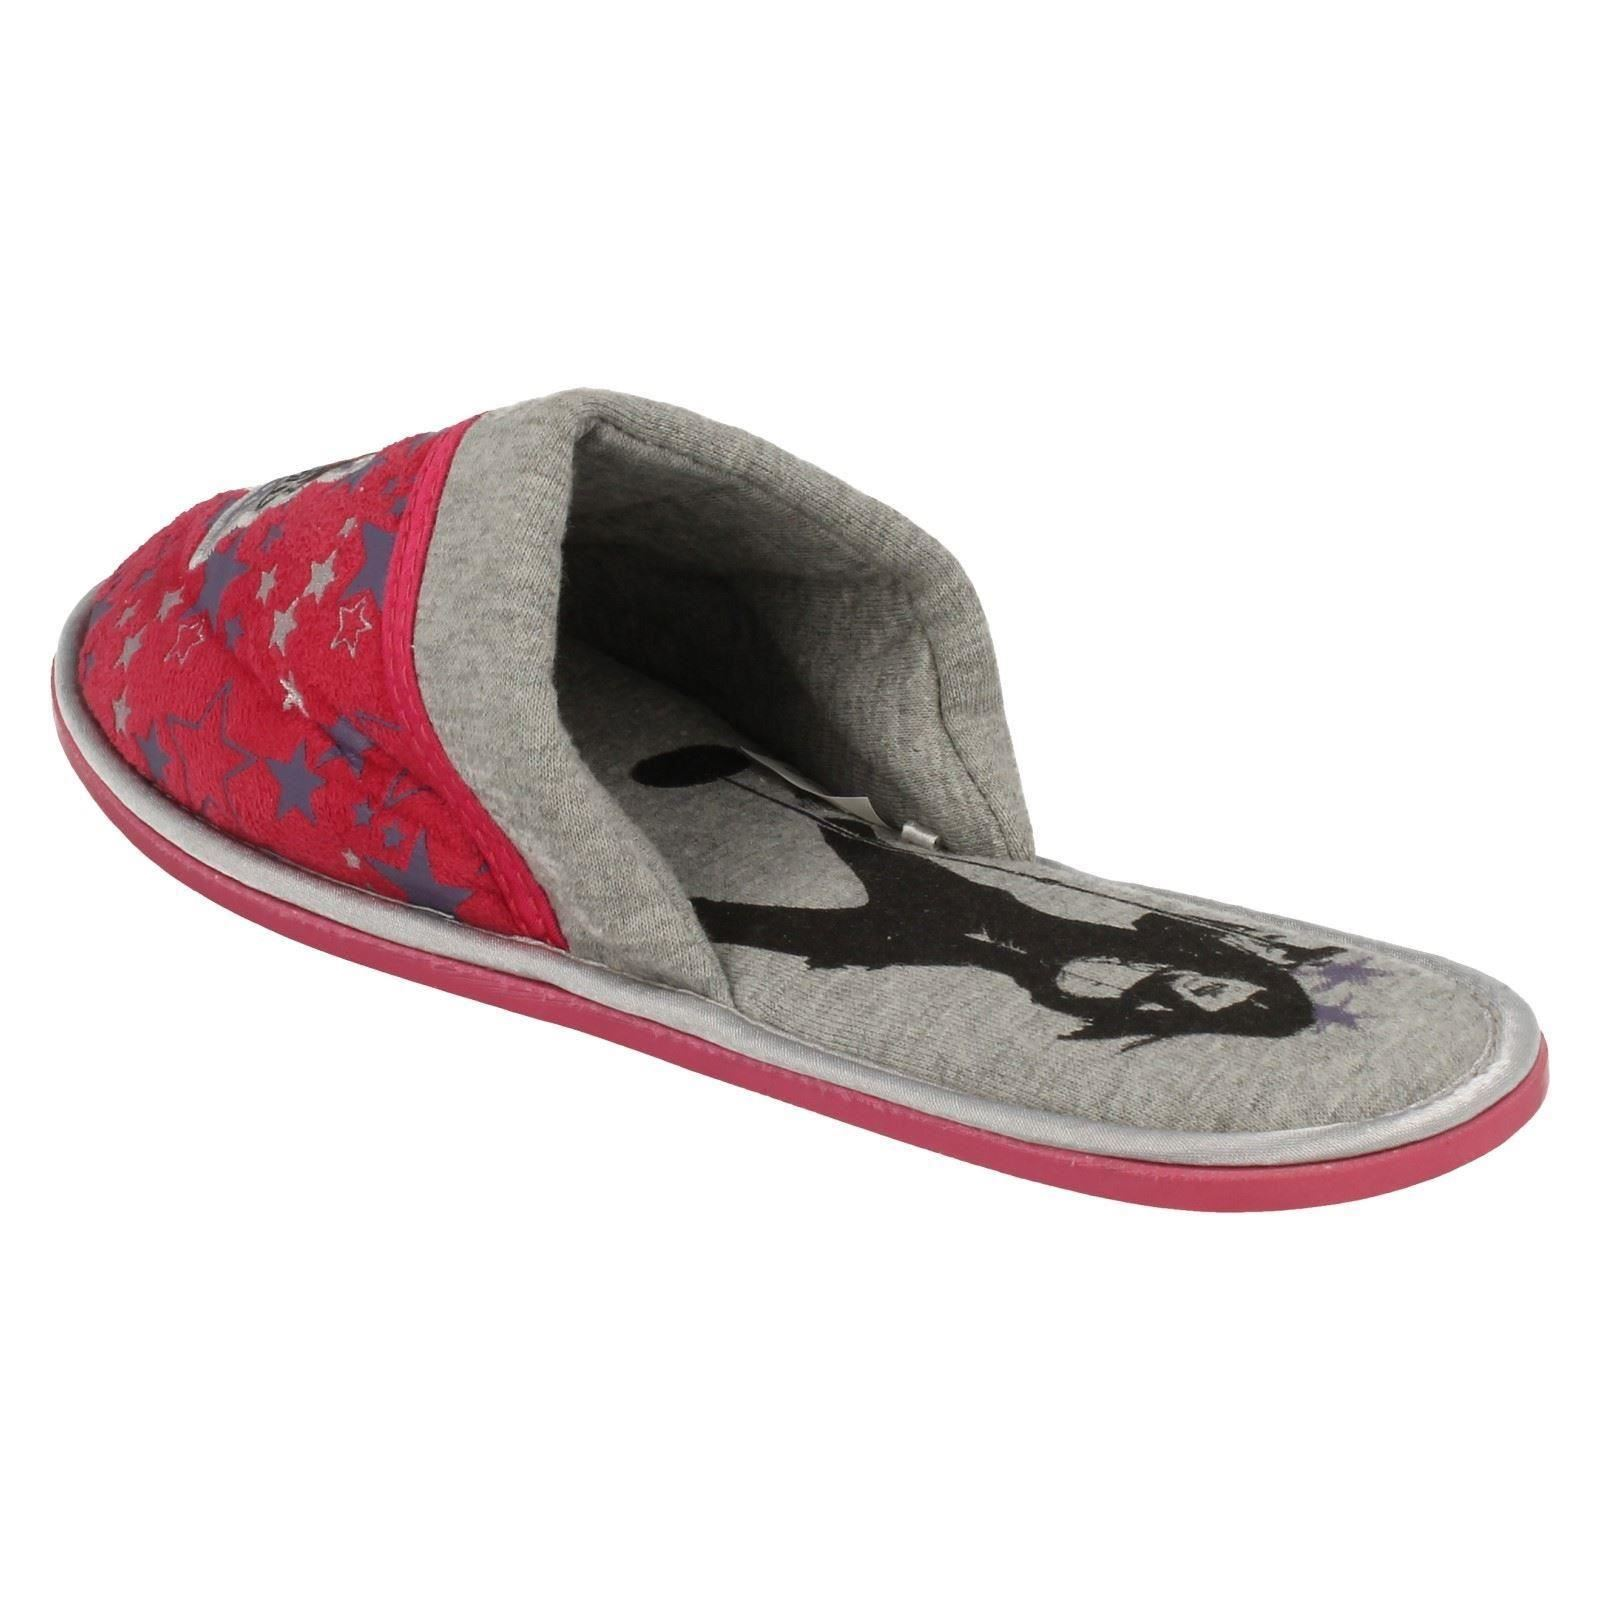 Girls Spot On Mule Slippers Camp Rock Star